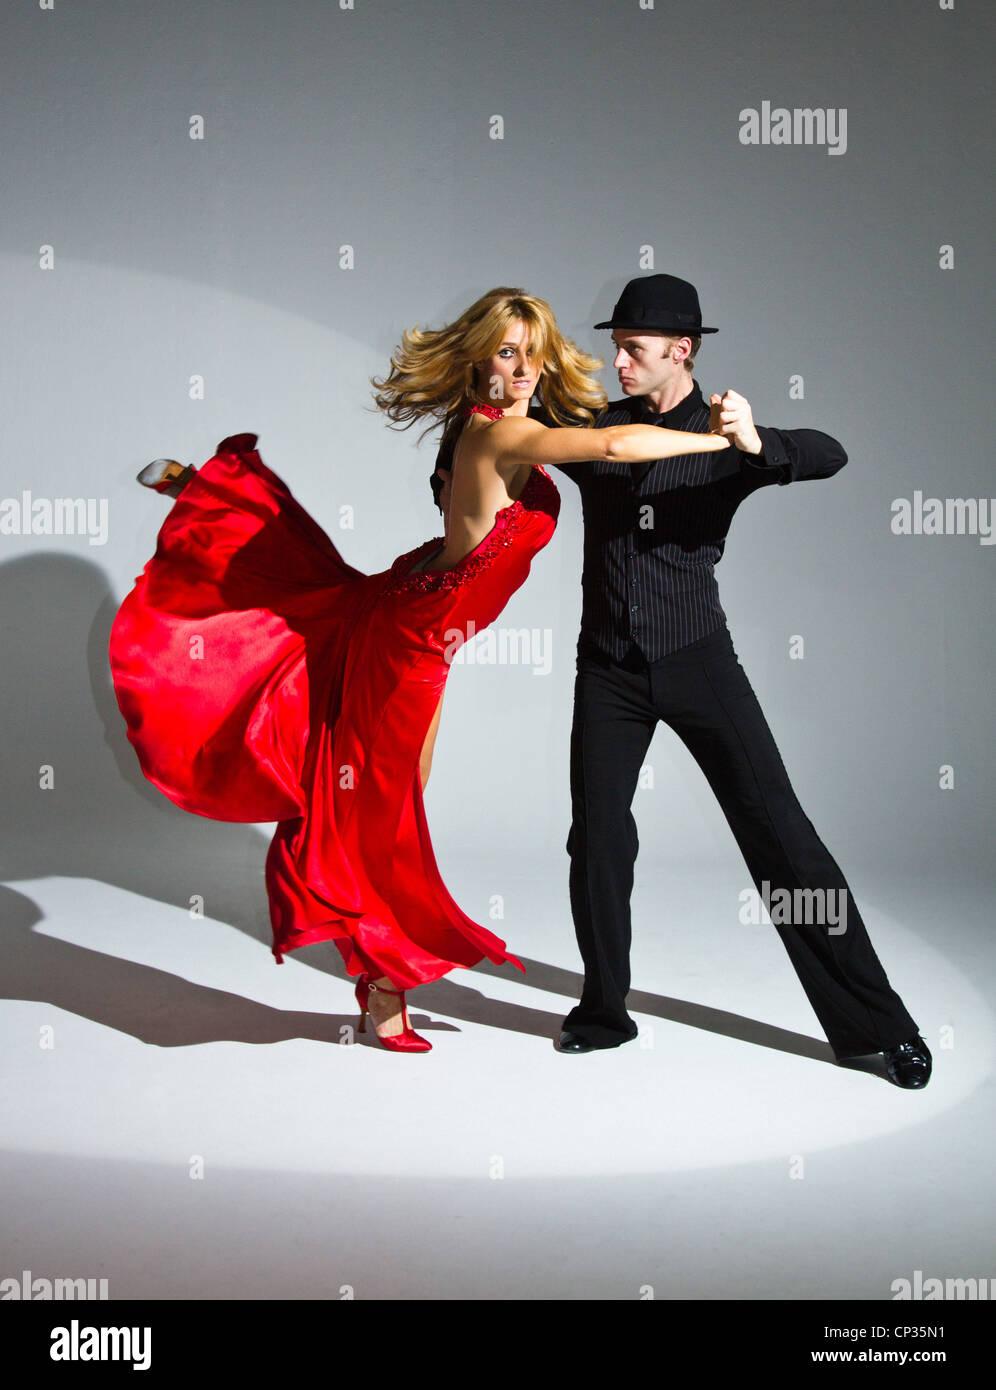 Swing Dance Class Stock Photos Images Alamy Go Back Gt Gallery For Merengue Steps Diagram Ballroom Dancers Studio Dynamic Amazingburn The Floor